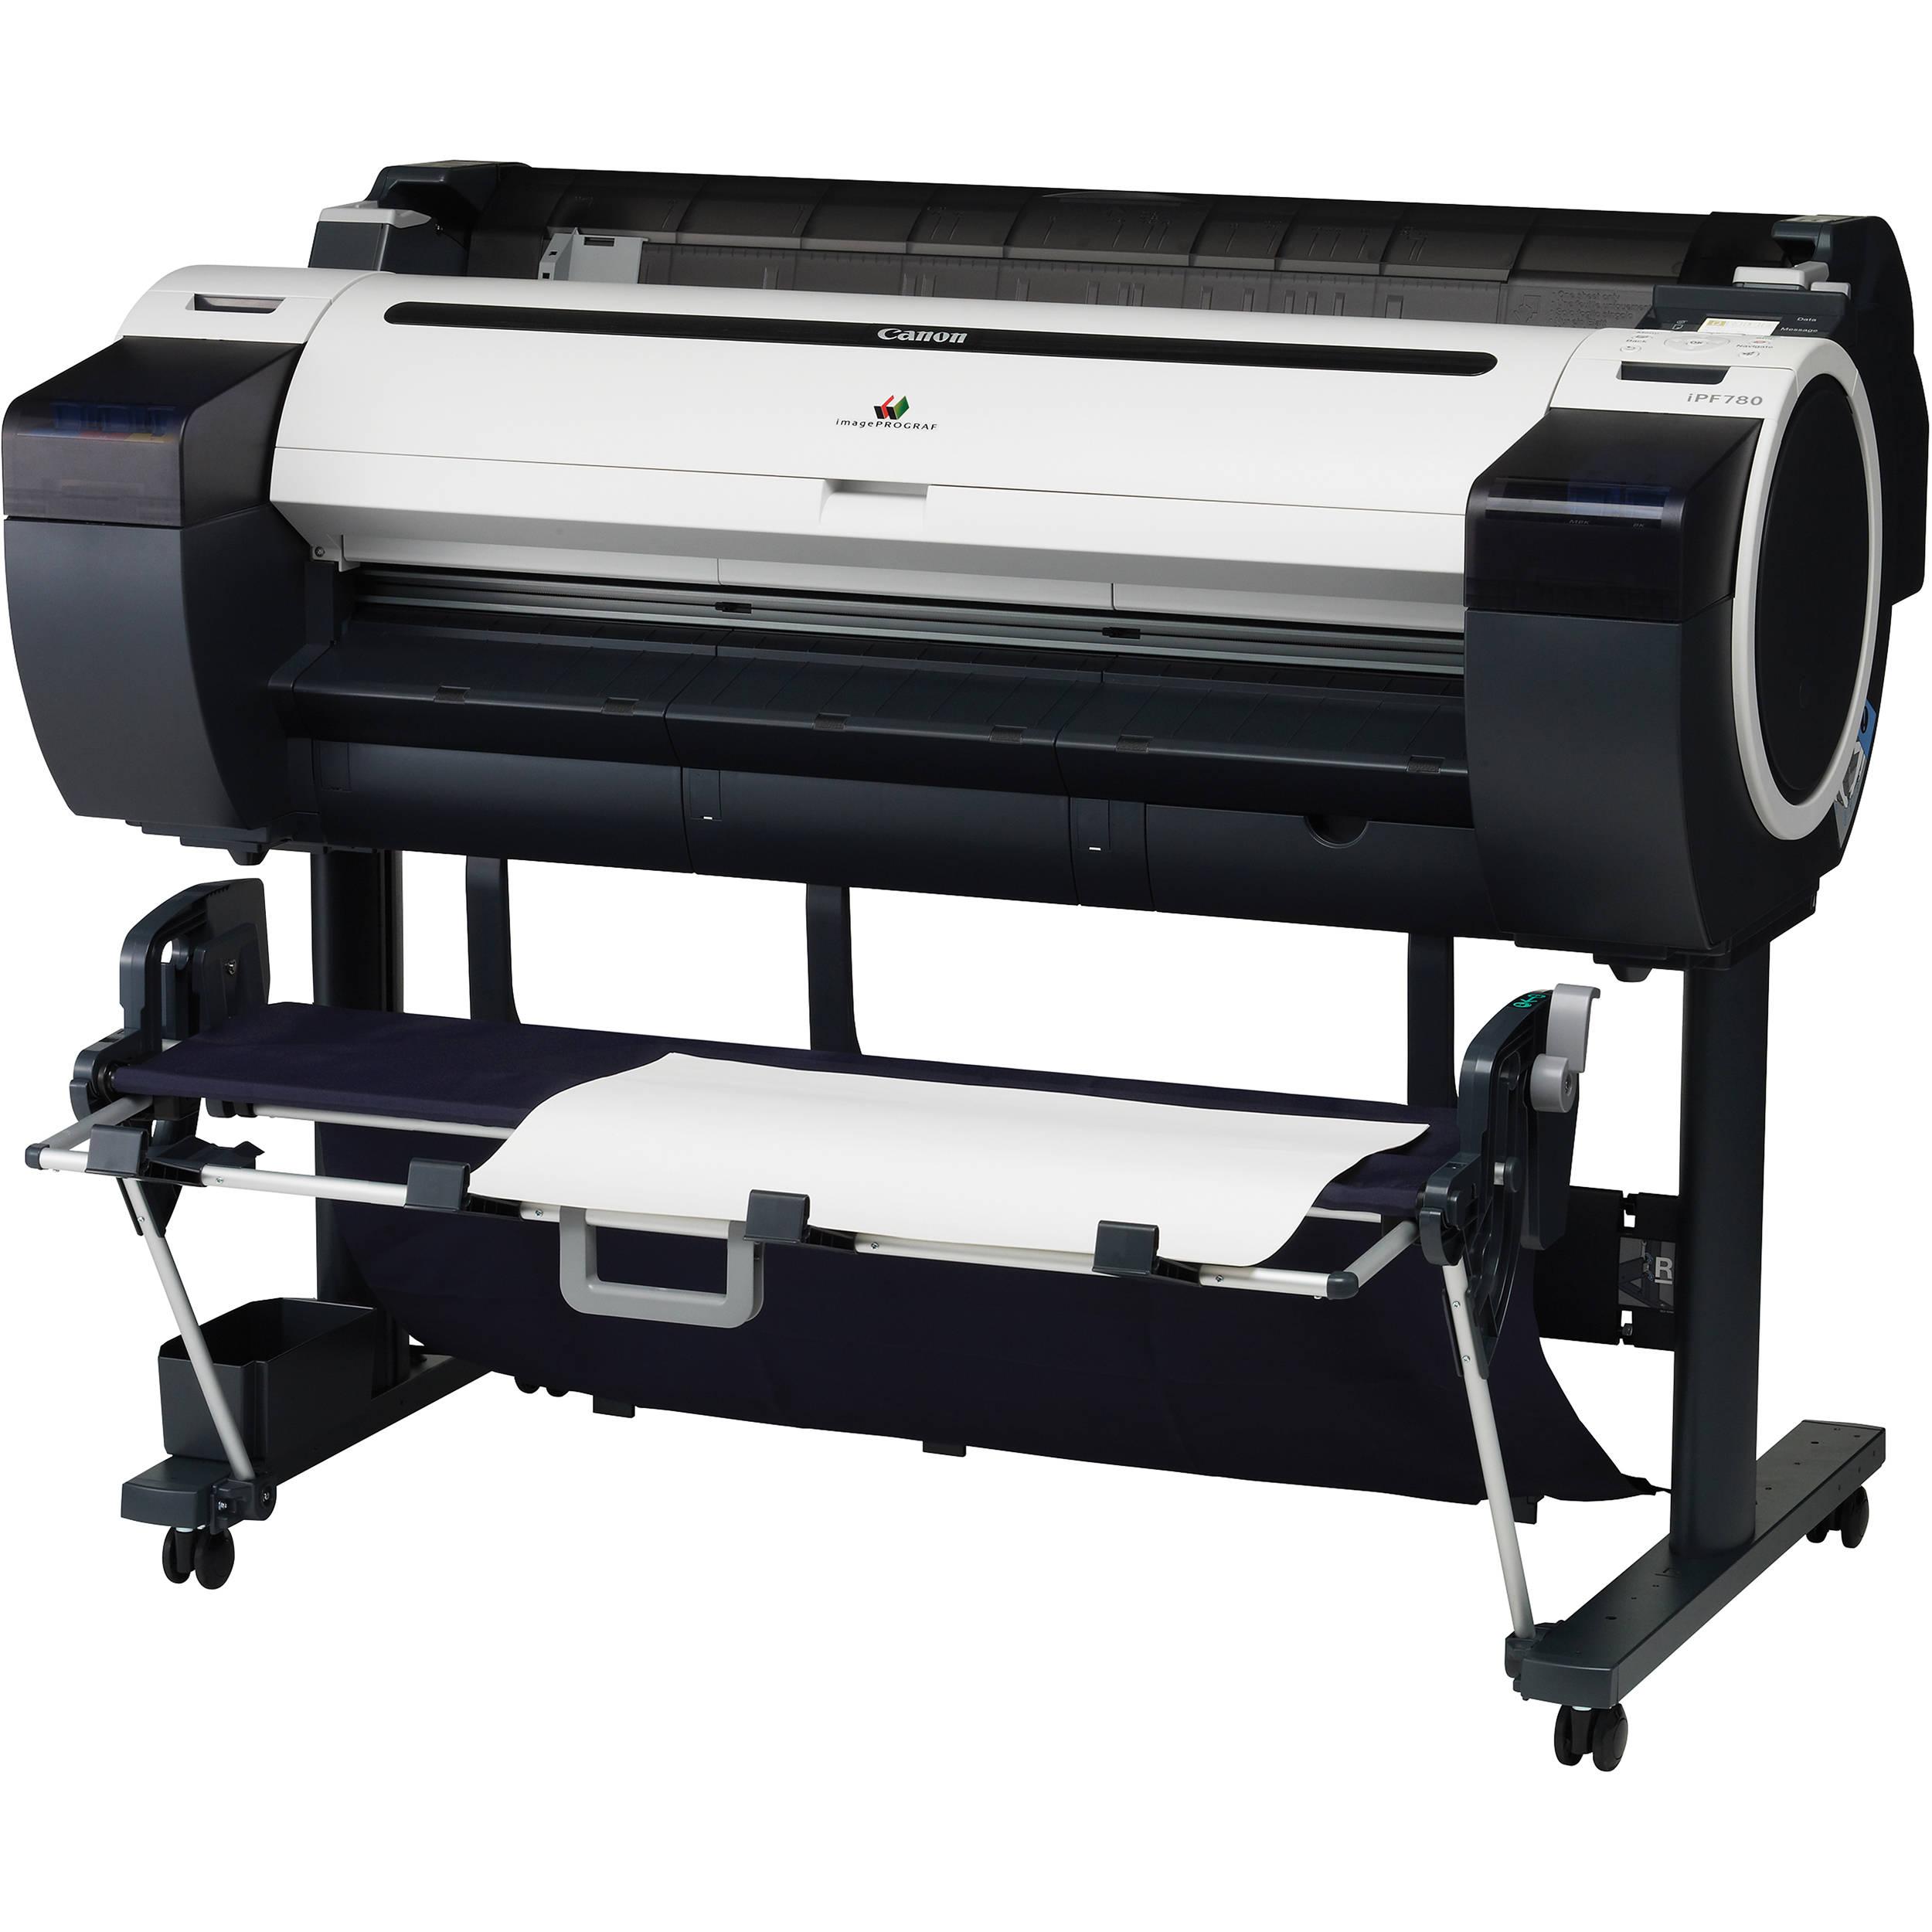 Canon imagePROGRAF iPF760 Printer Driver Download